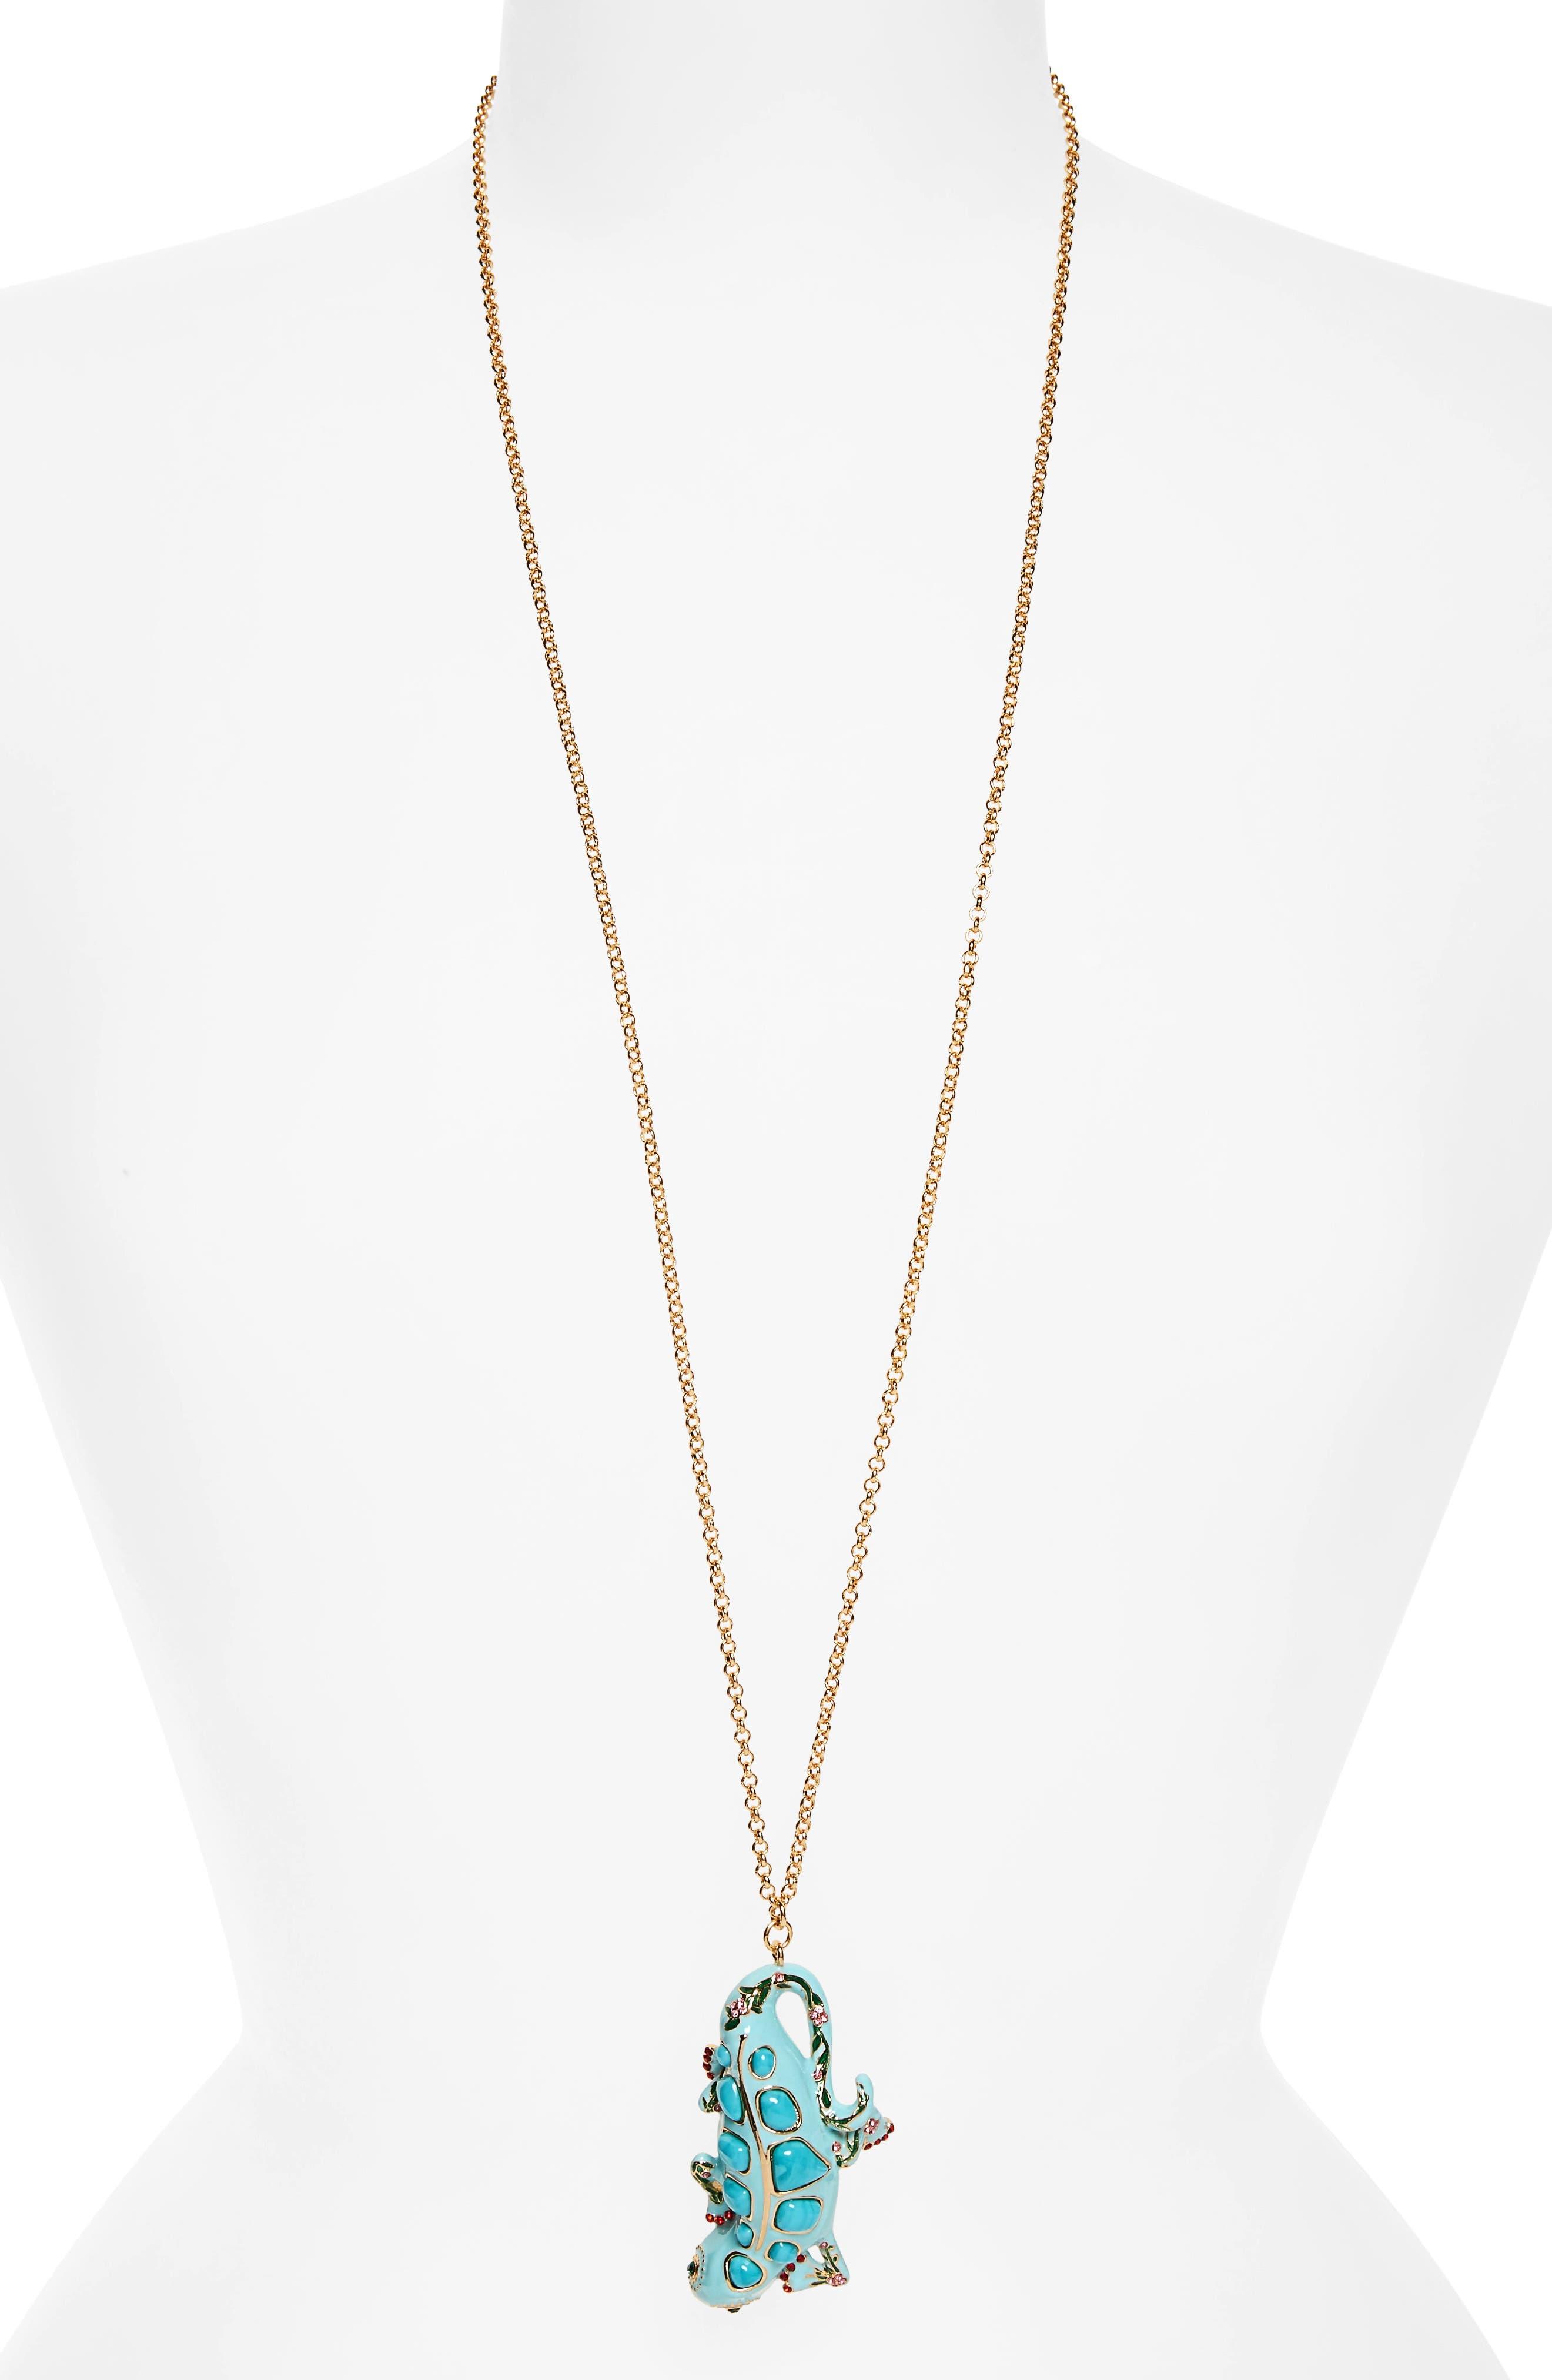 KATE SPADE NEW YORK baja bound pendant necklace